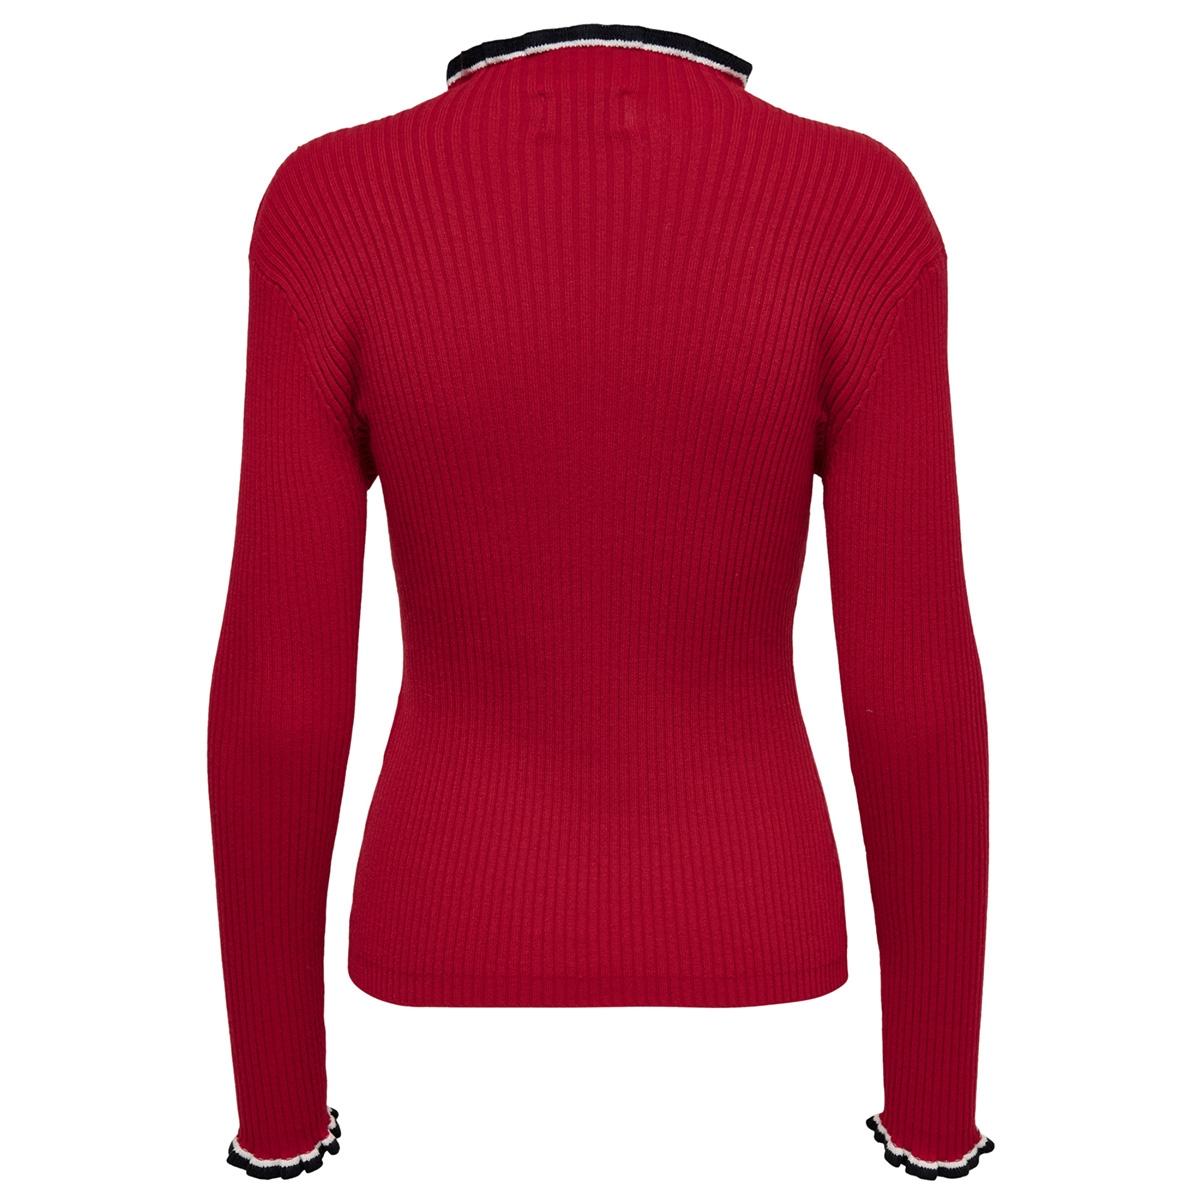 onllaura l/s pullover cc knt 15169588 only trui goji berry/w cloud dancer